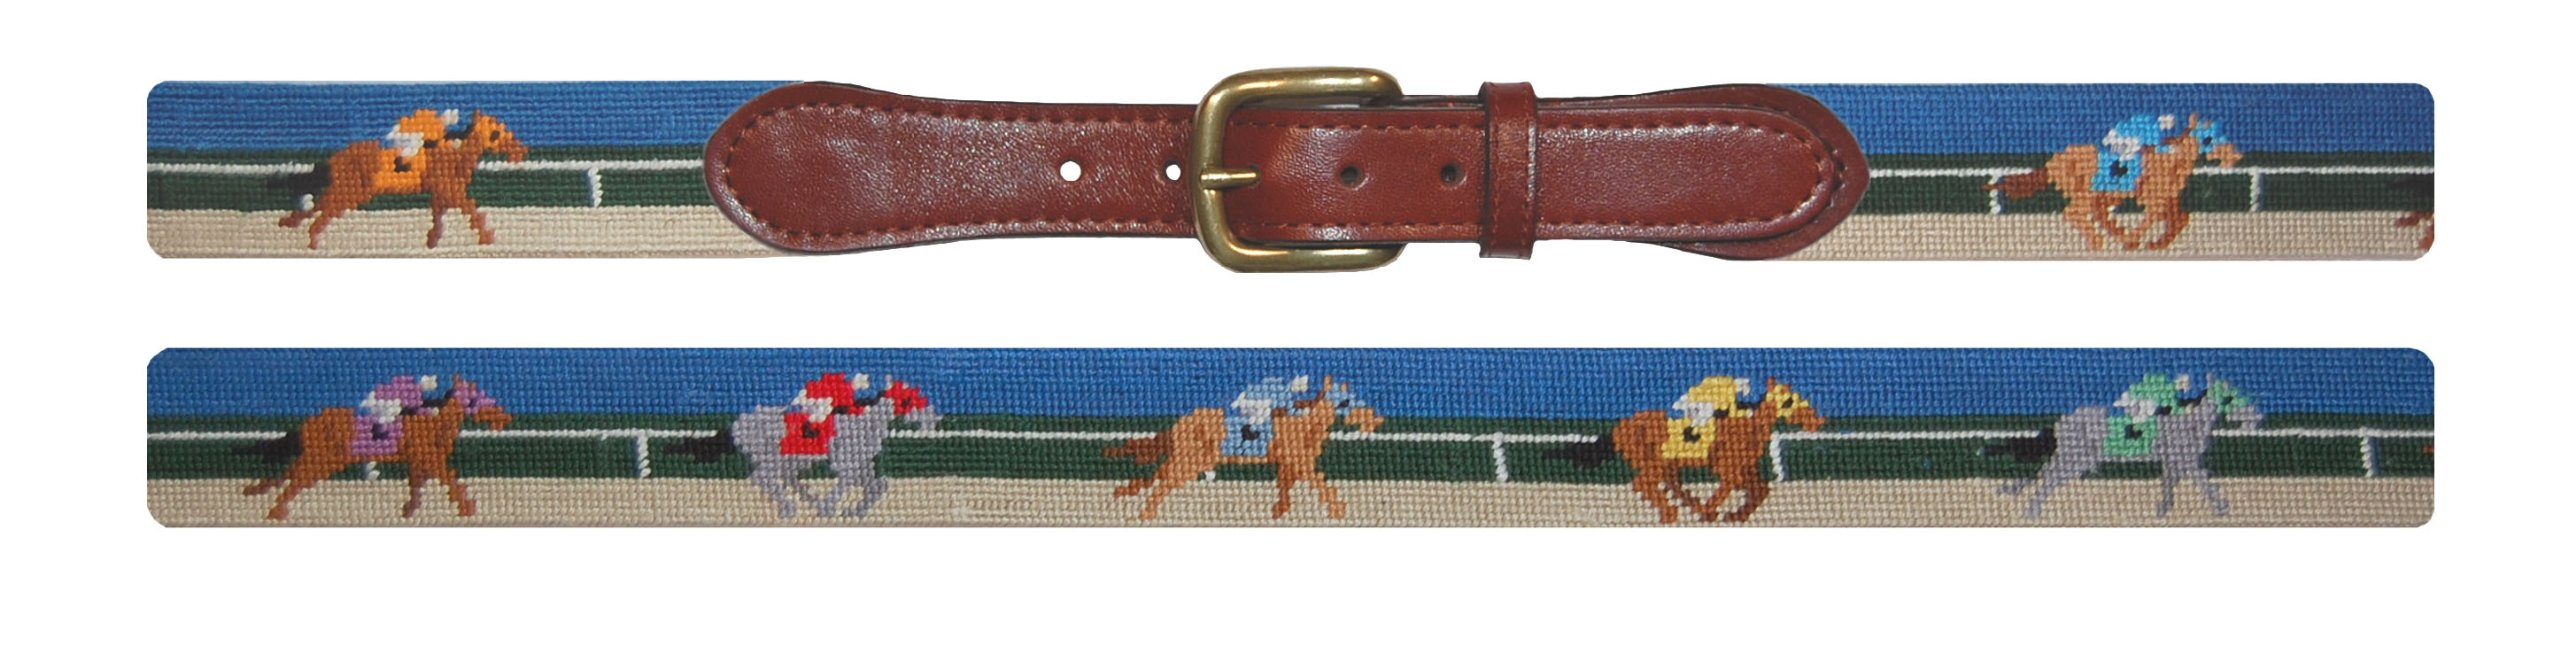 Smathers & Branson Derby Scene Traditional Needlepoint Belt, Size 40 (B-105-40)